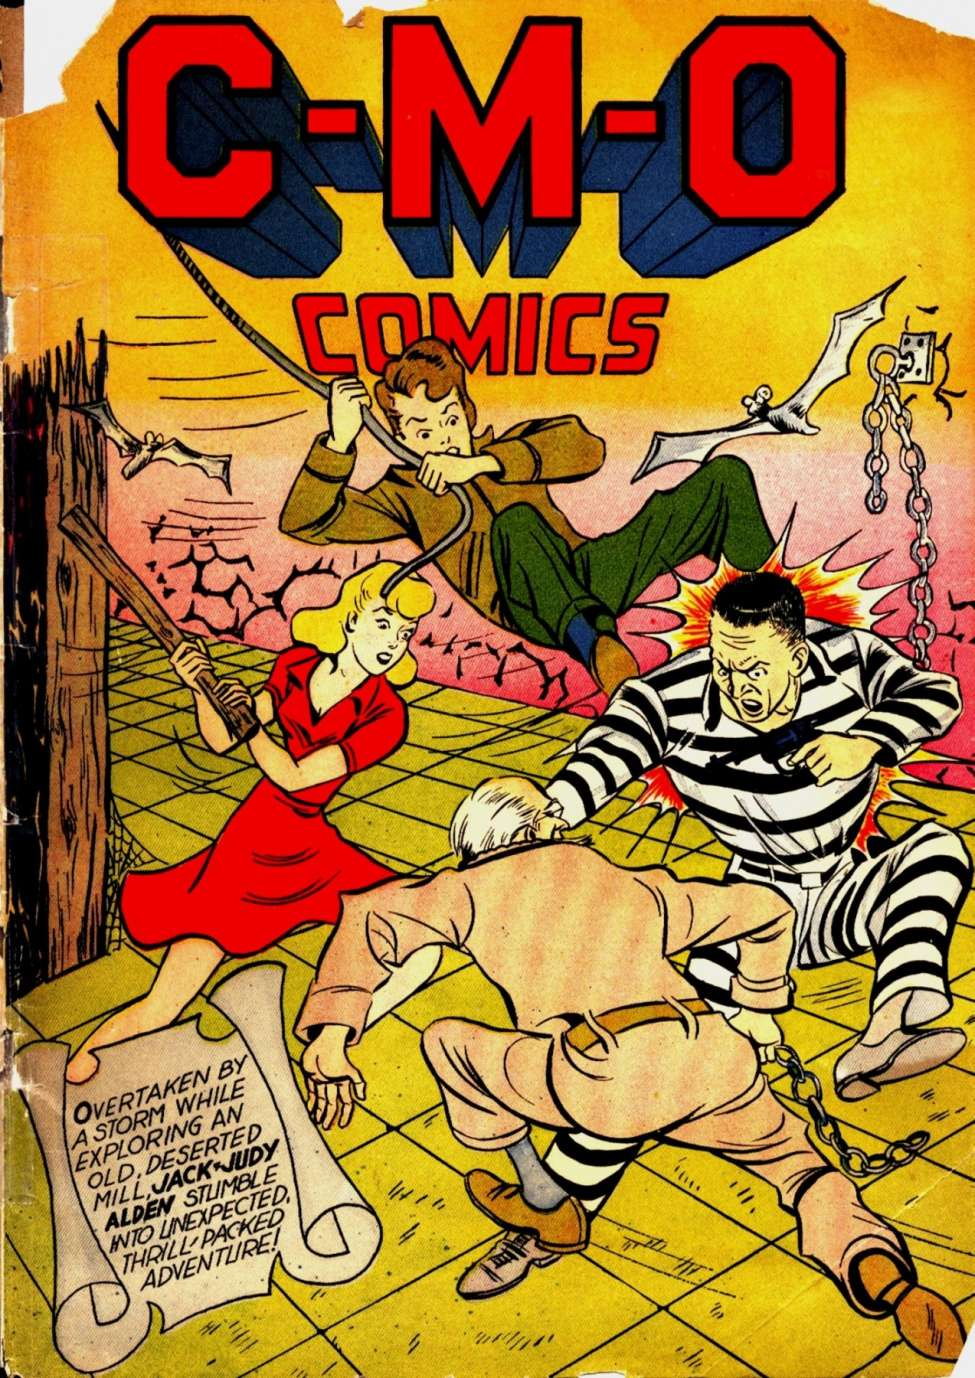 C-M-O Comics #1 by Centaur